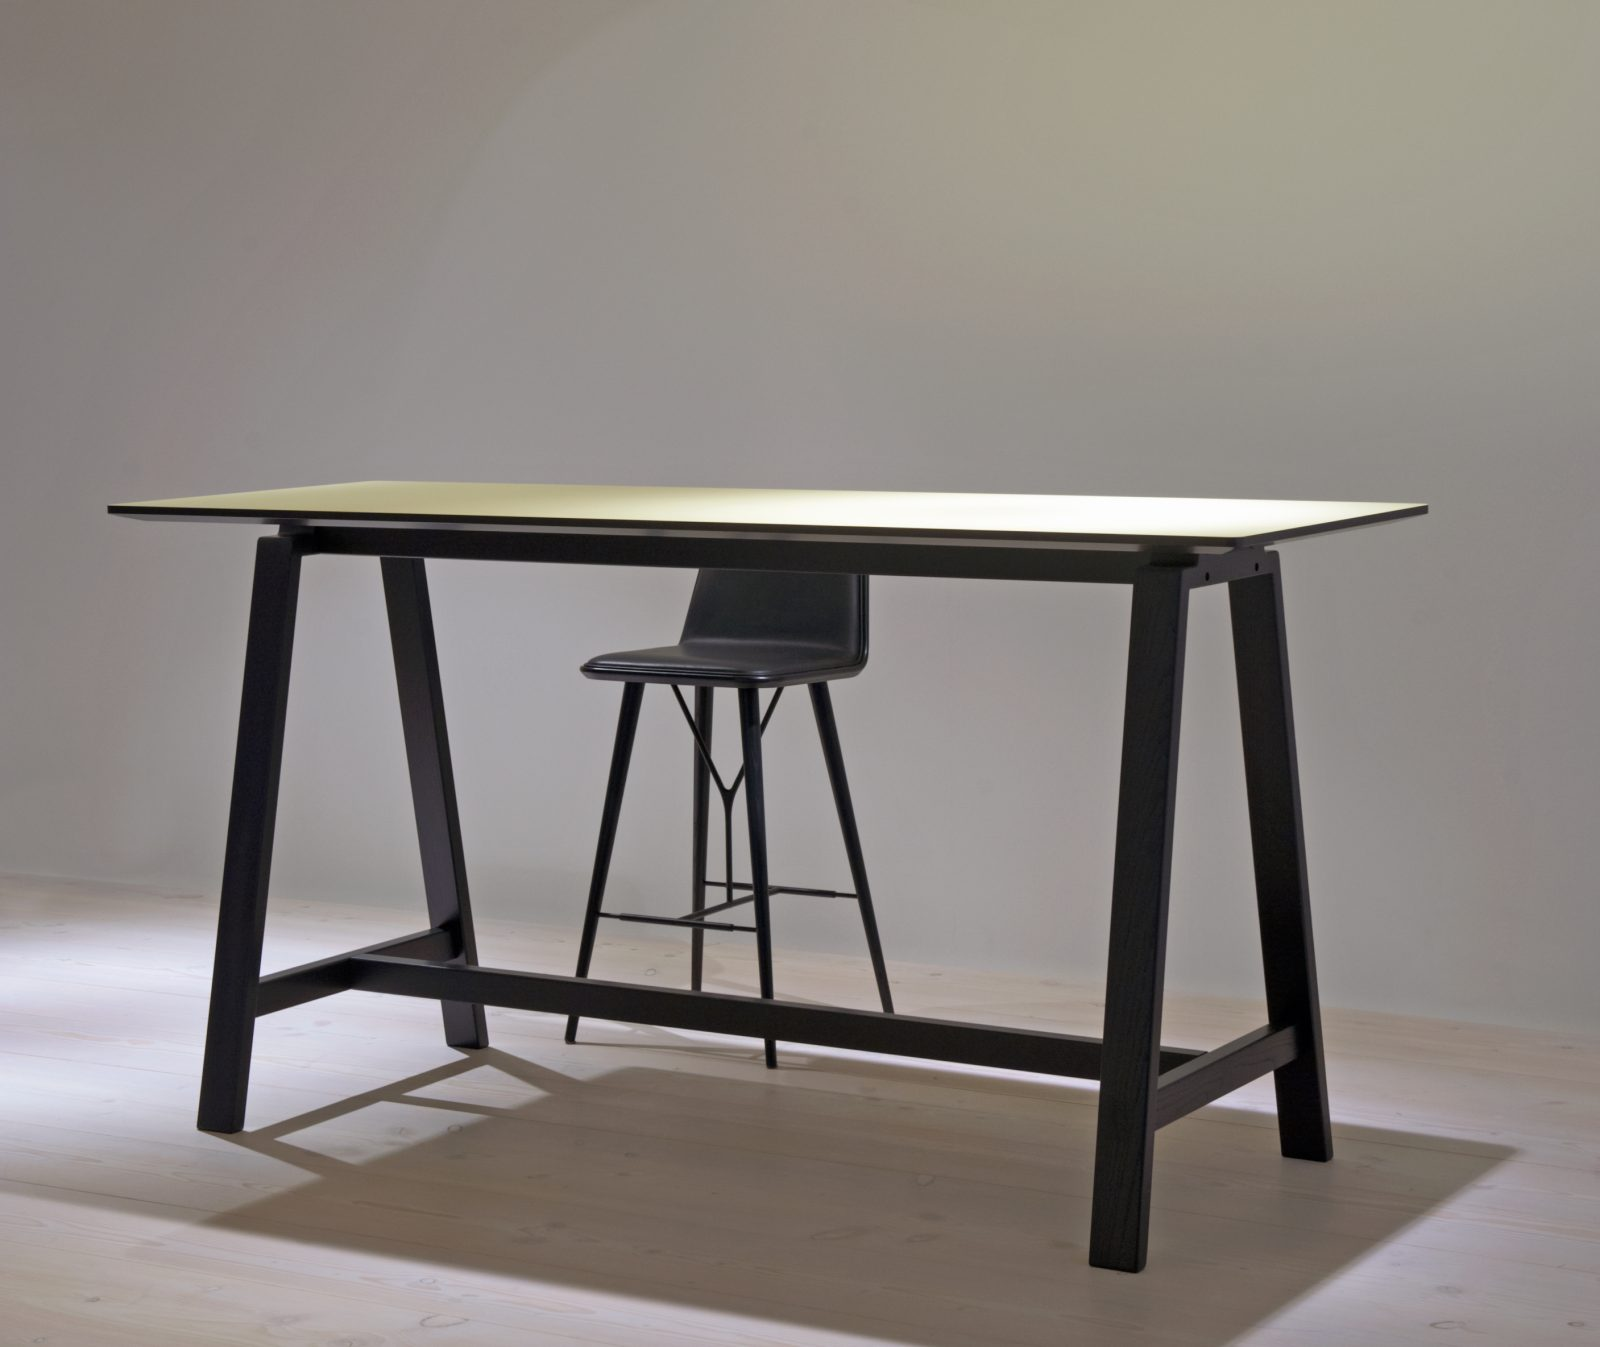 Andersen Furniture - HT1 Bartisch